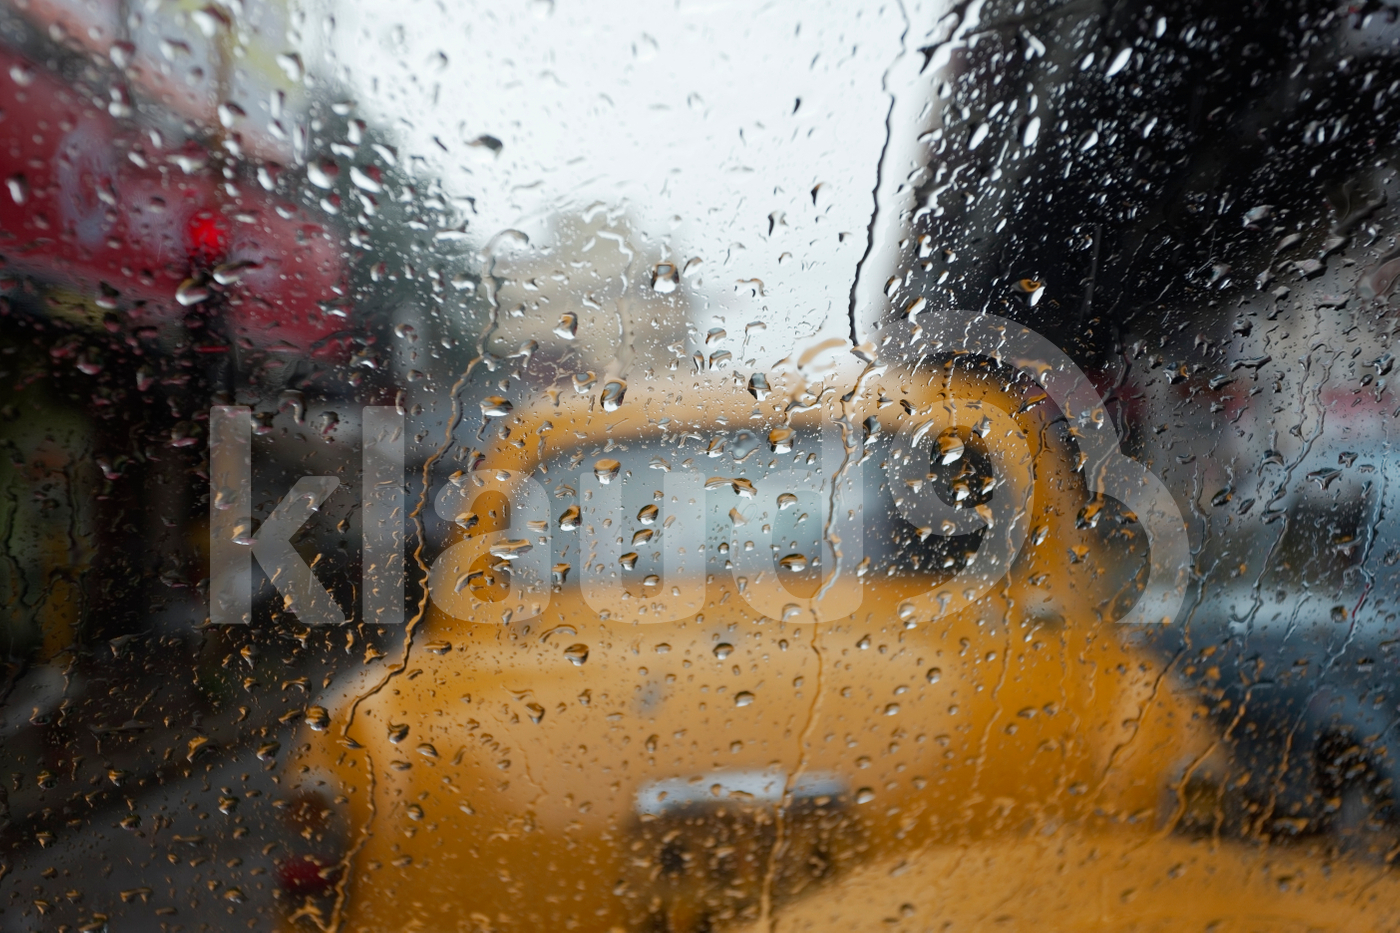 Rain drops on wind screen of a car showing yellow cabs Kolkata, India.